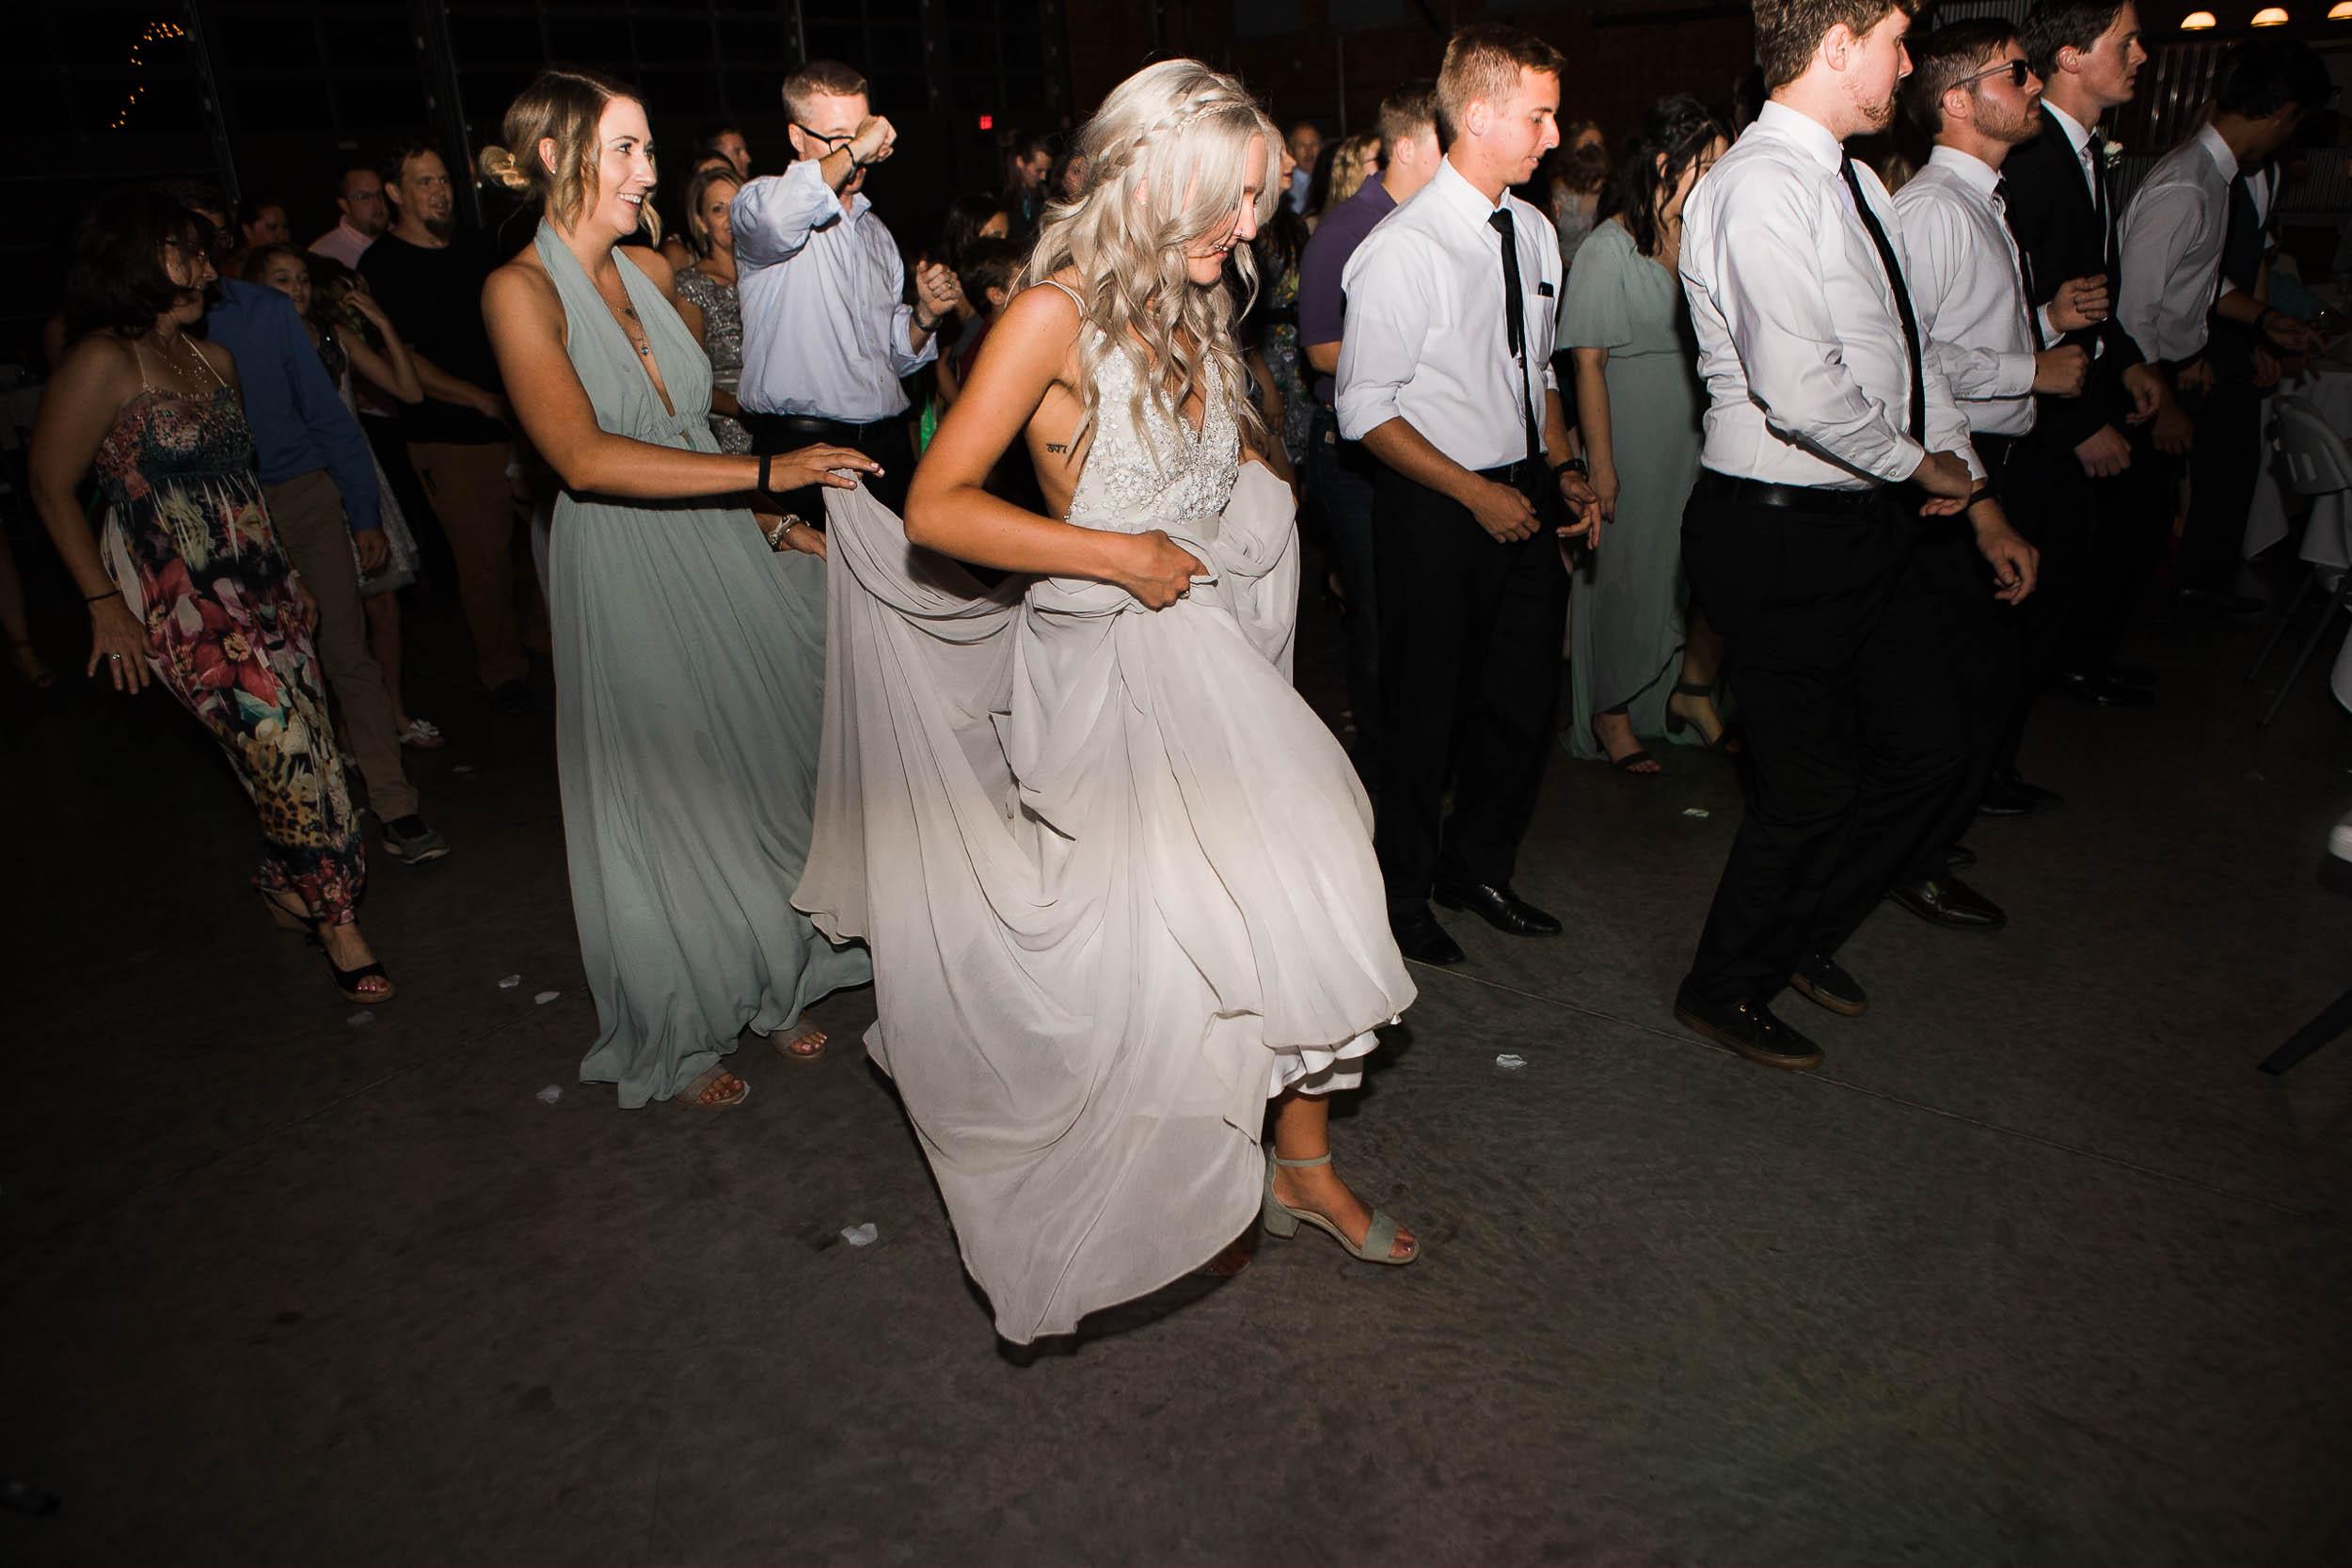 KyleLovesTori-Casper-Wyoming-Wedding-159.jpg